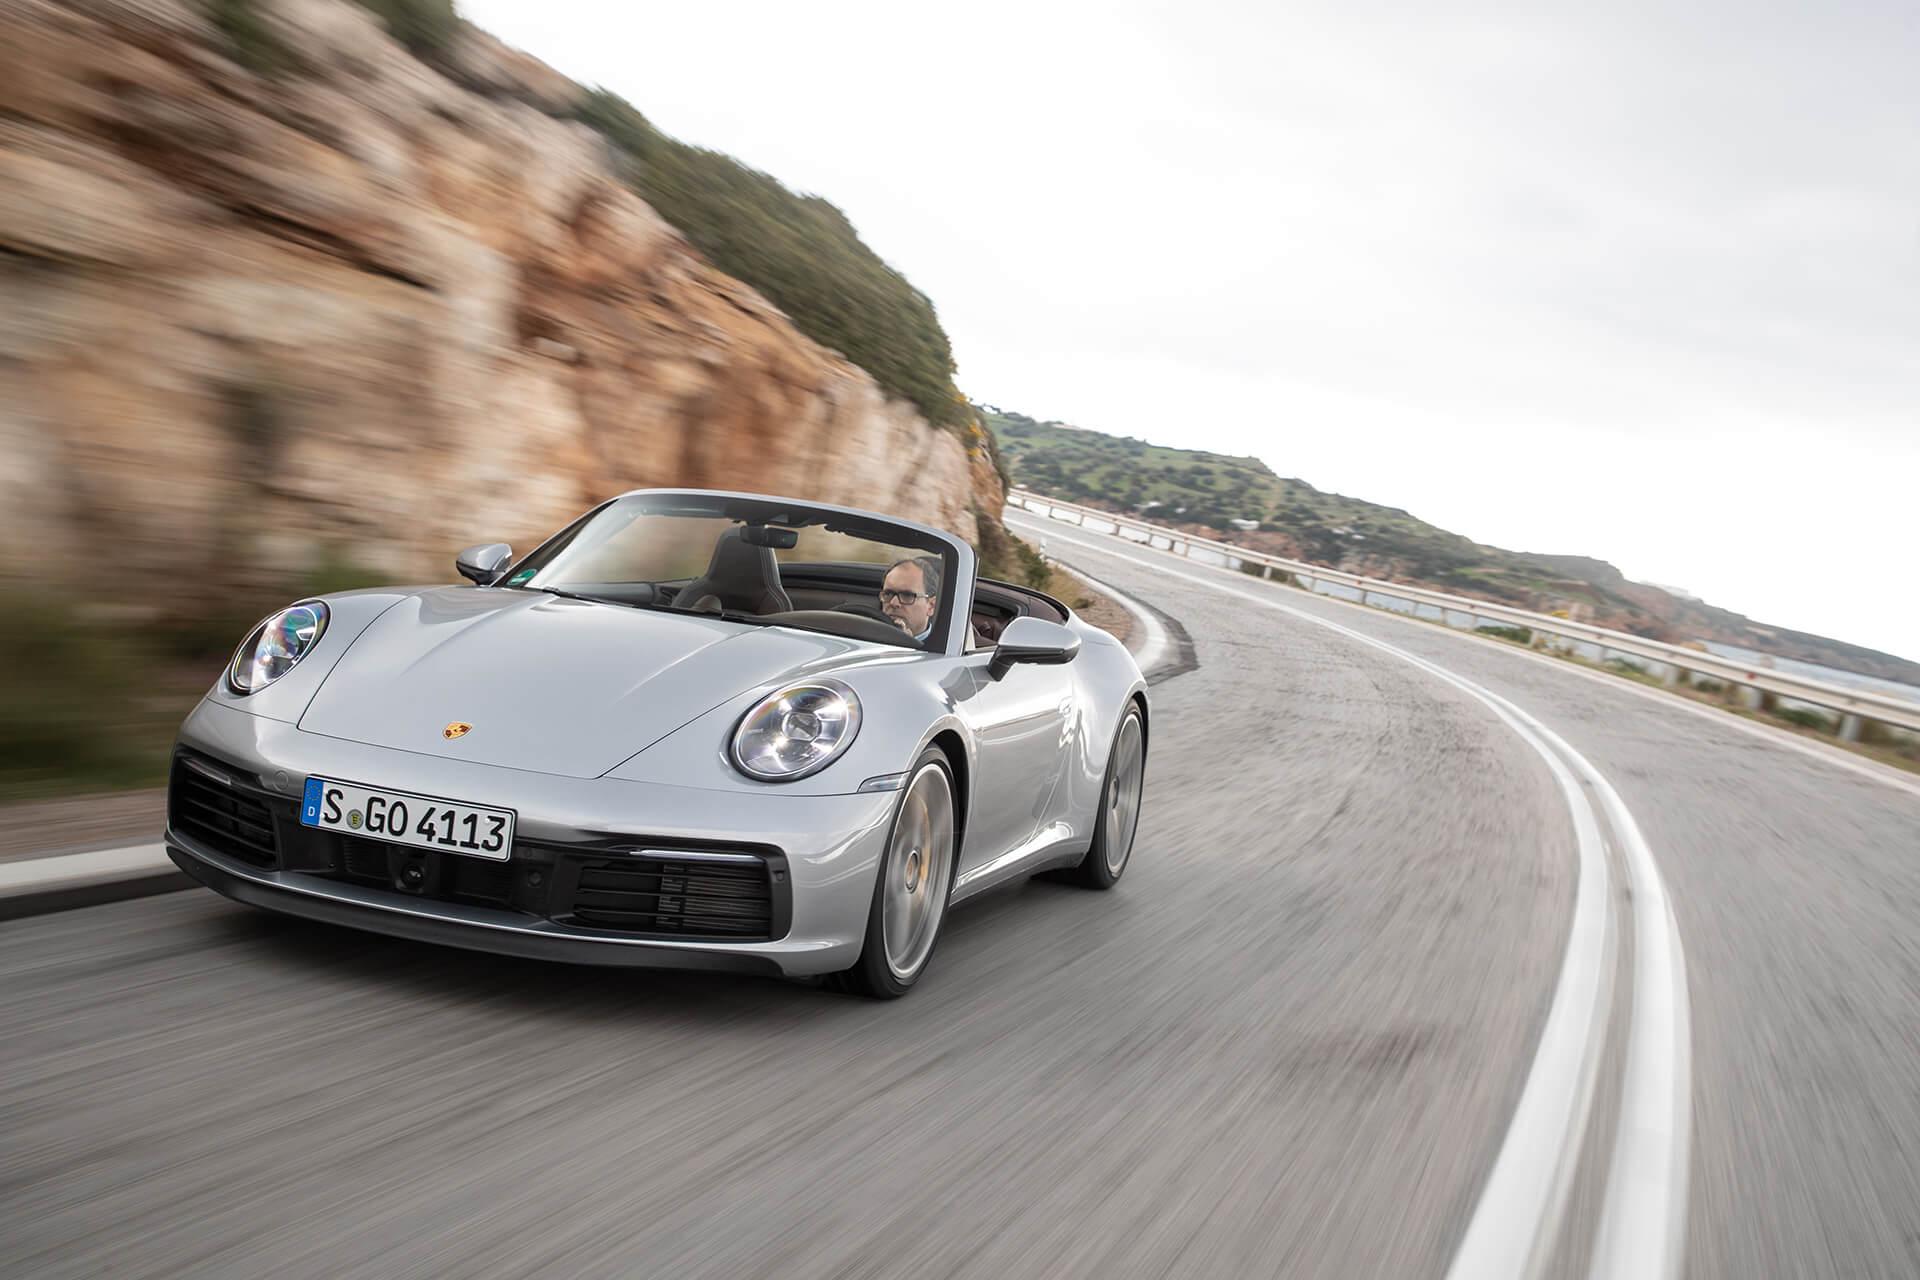 Porsche 911 Carrera 4S Cabriolet 2019